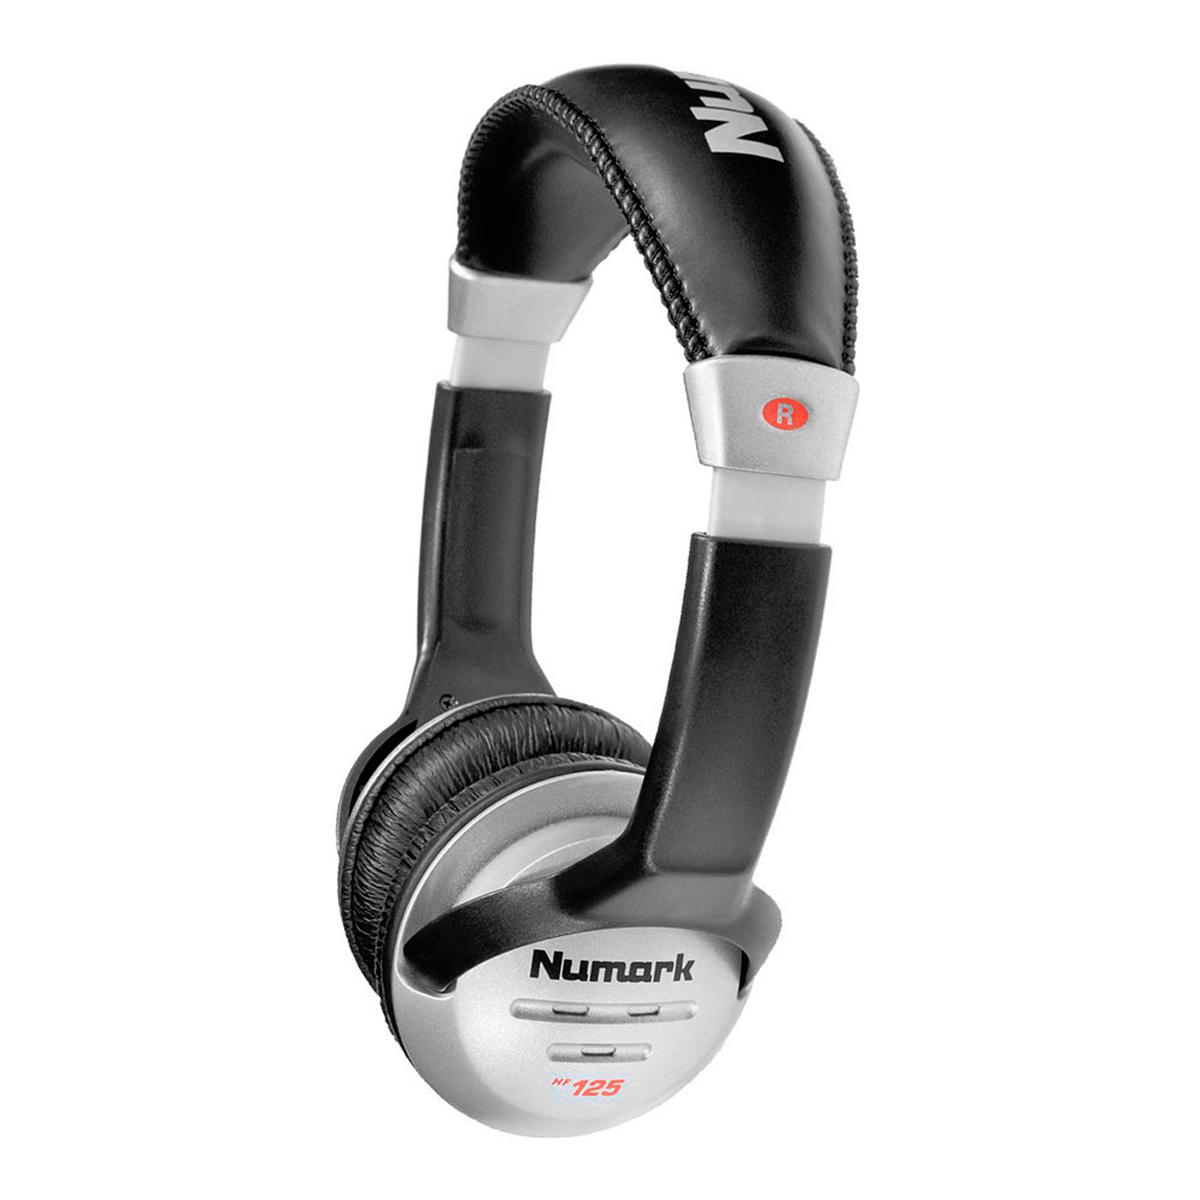 Fone de Ouvido On-ear 20 Hz - 20 KHz 32 Ohms - HF 125 Numark